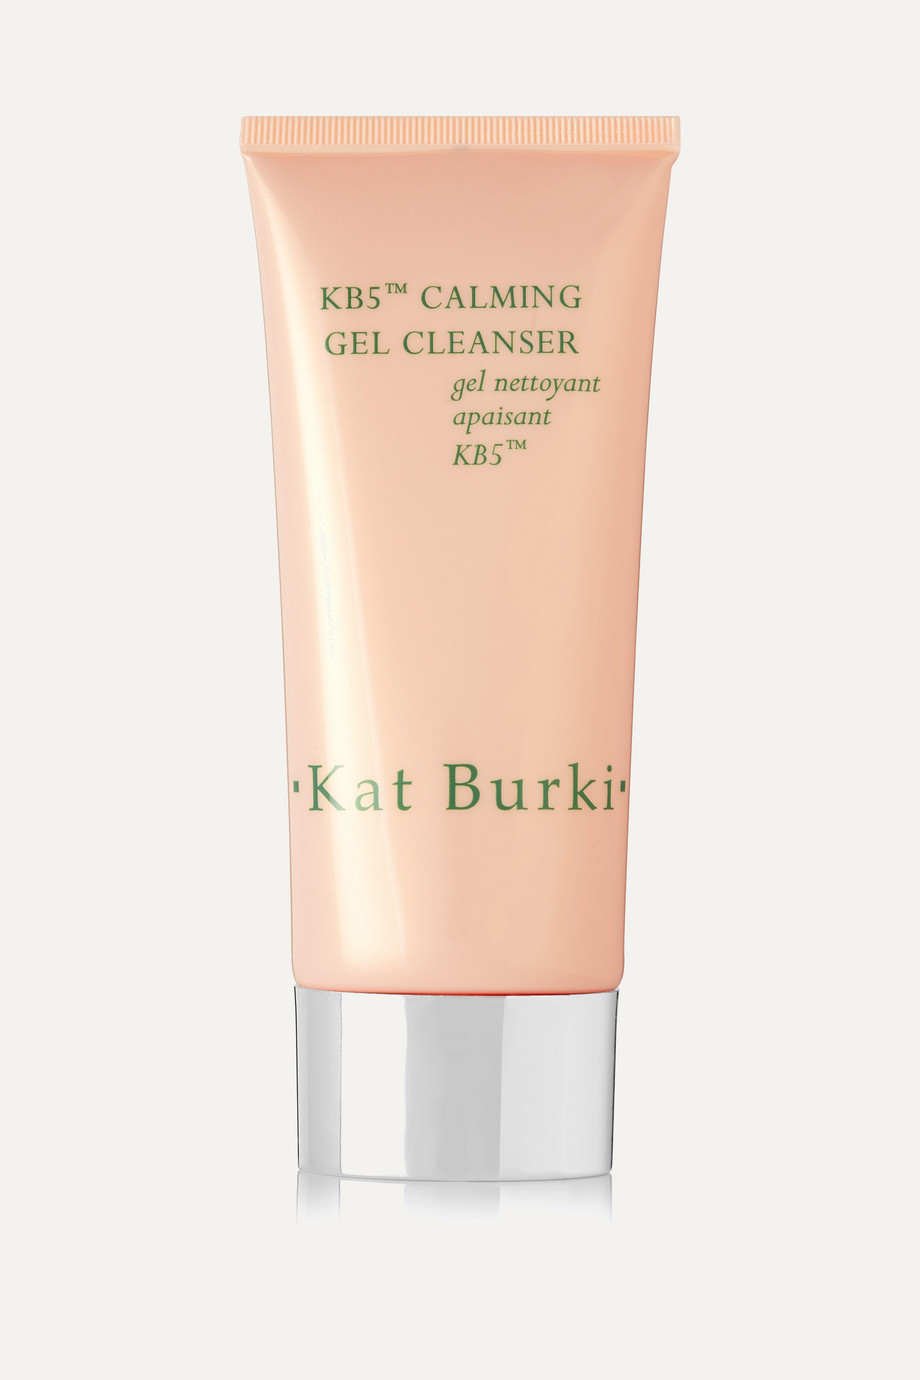 Kat Burki KB5 Calming Gel Cleanser, 130 ml – Reinigungsgel